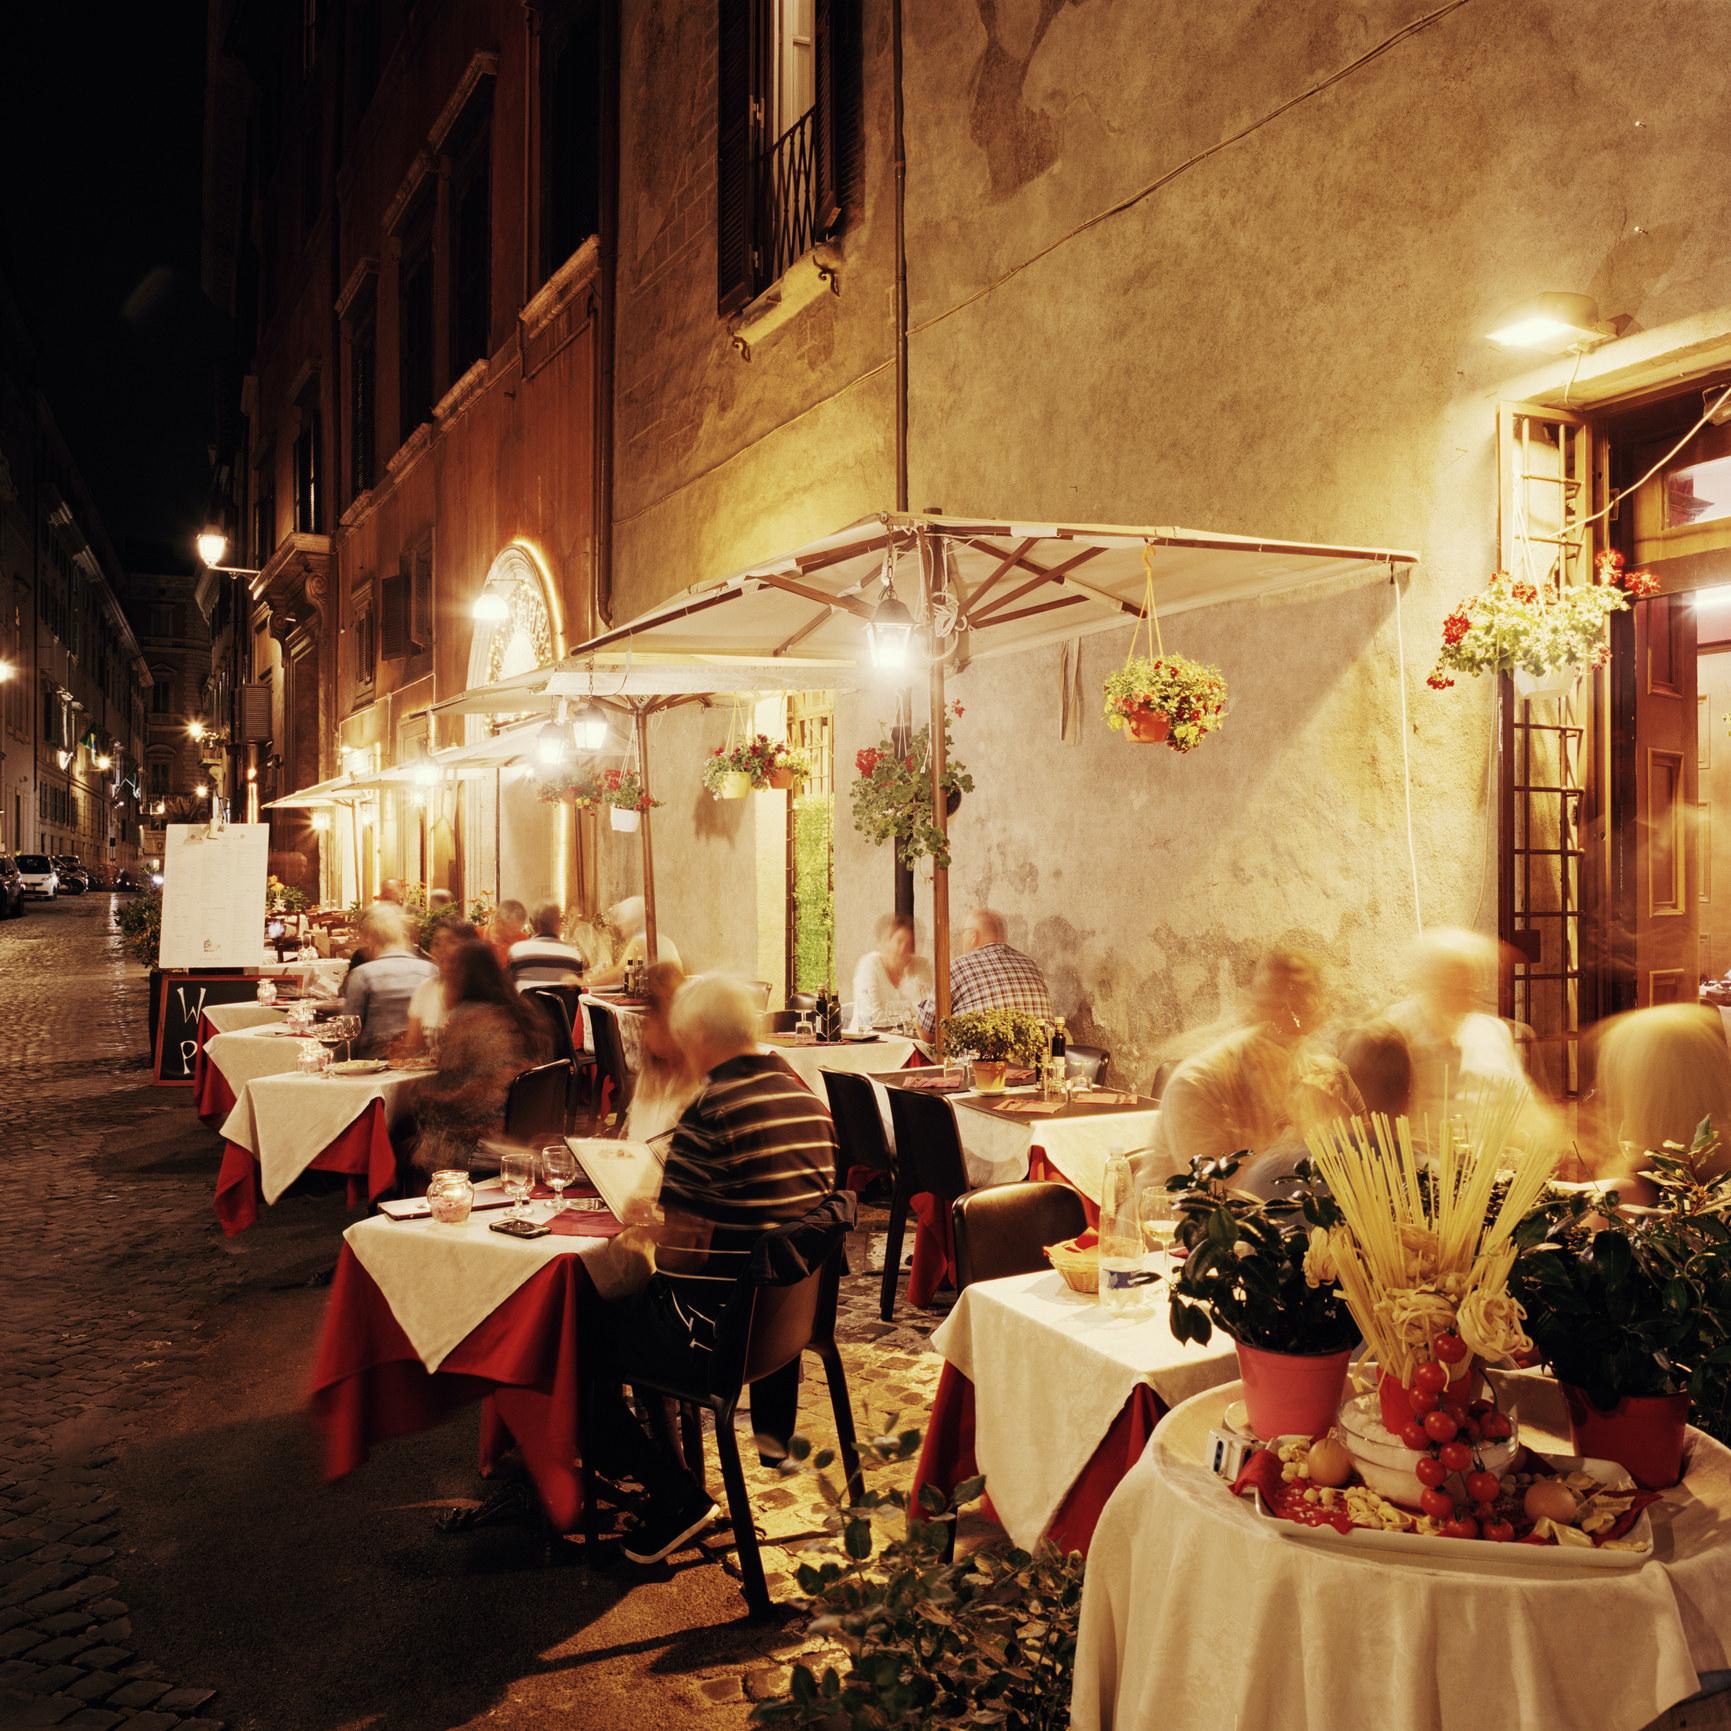 An Italian restaurant at night.